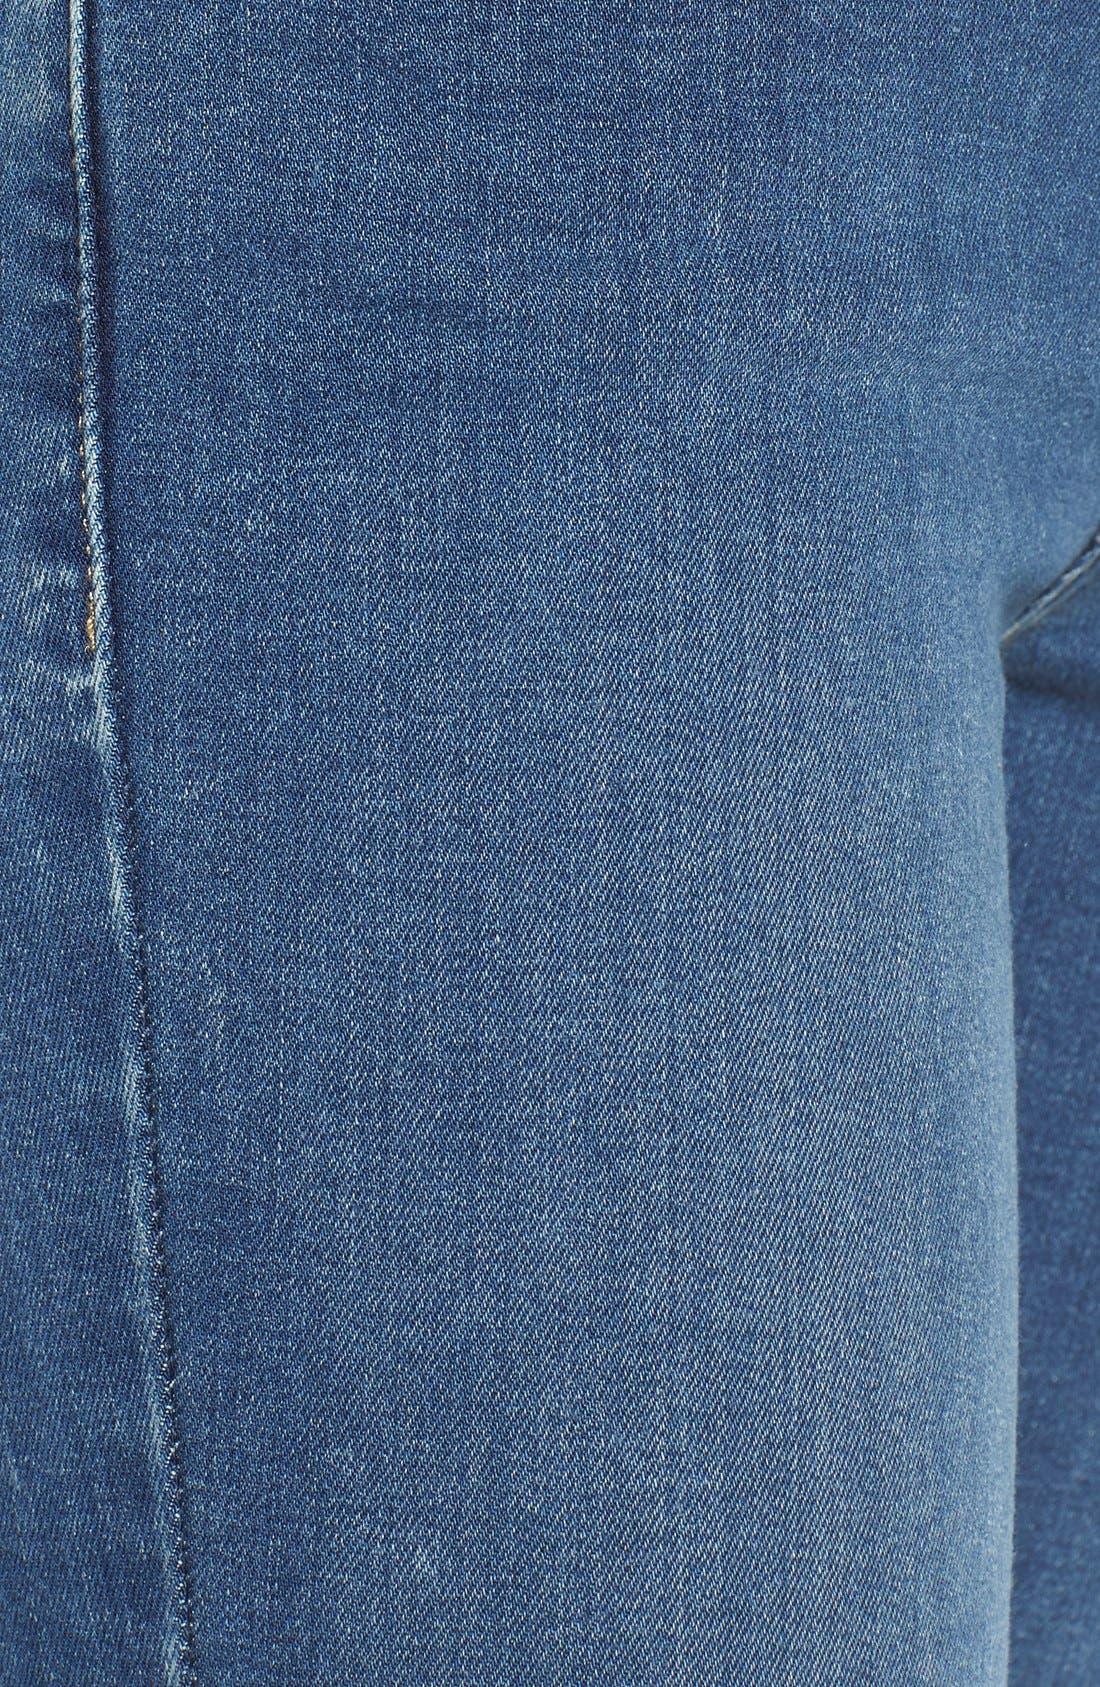 Alternate Image 5  - Levi's® '710' Super Skinny Jeans (Pacific Drive)